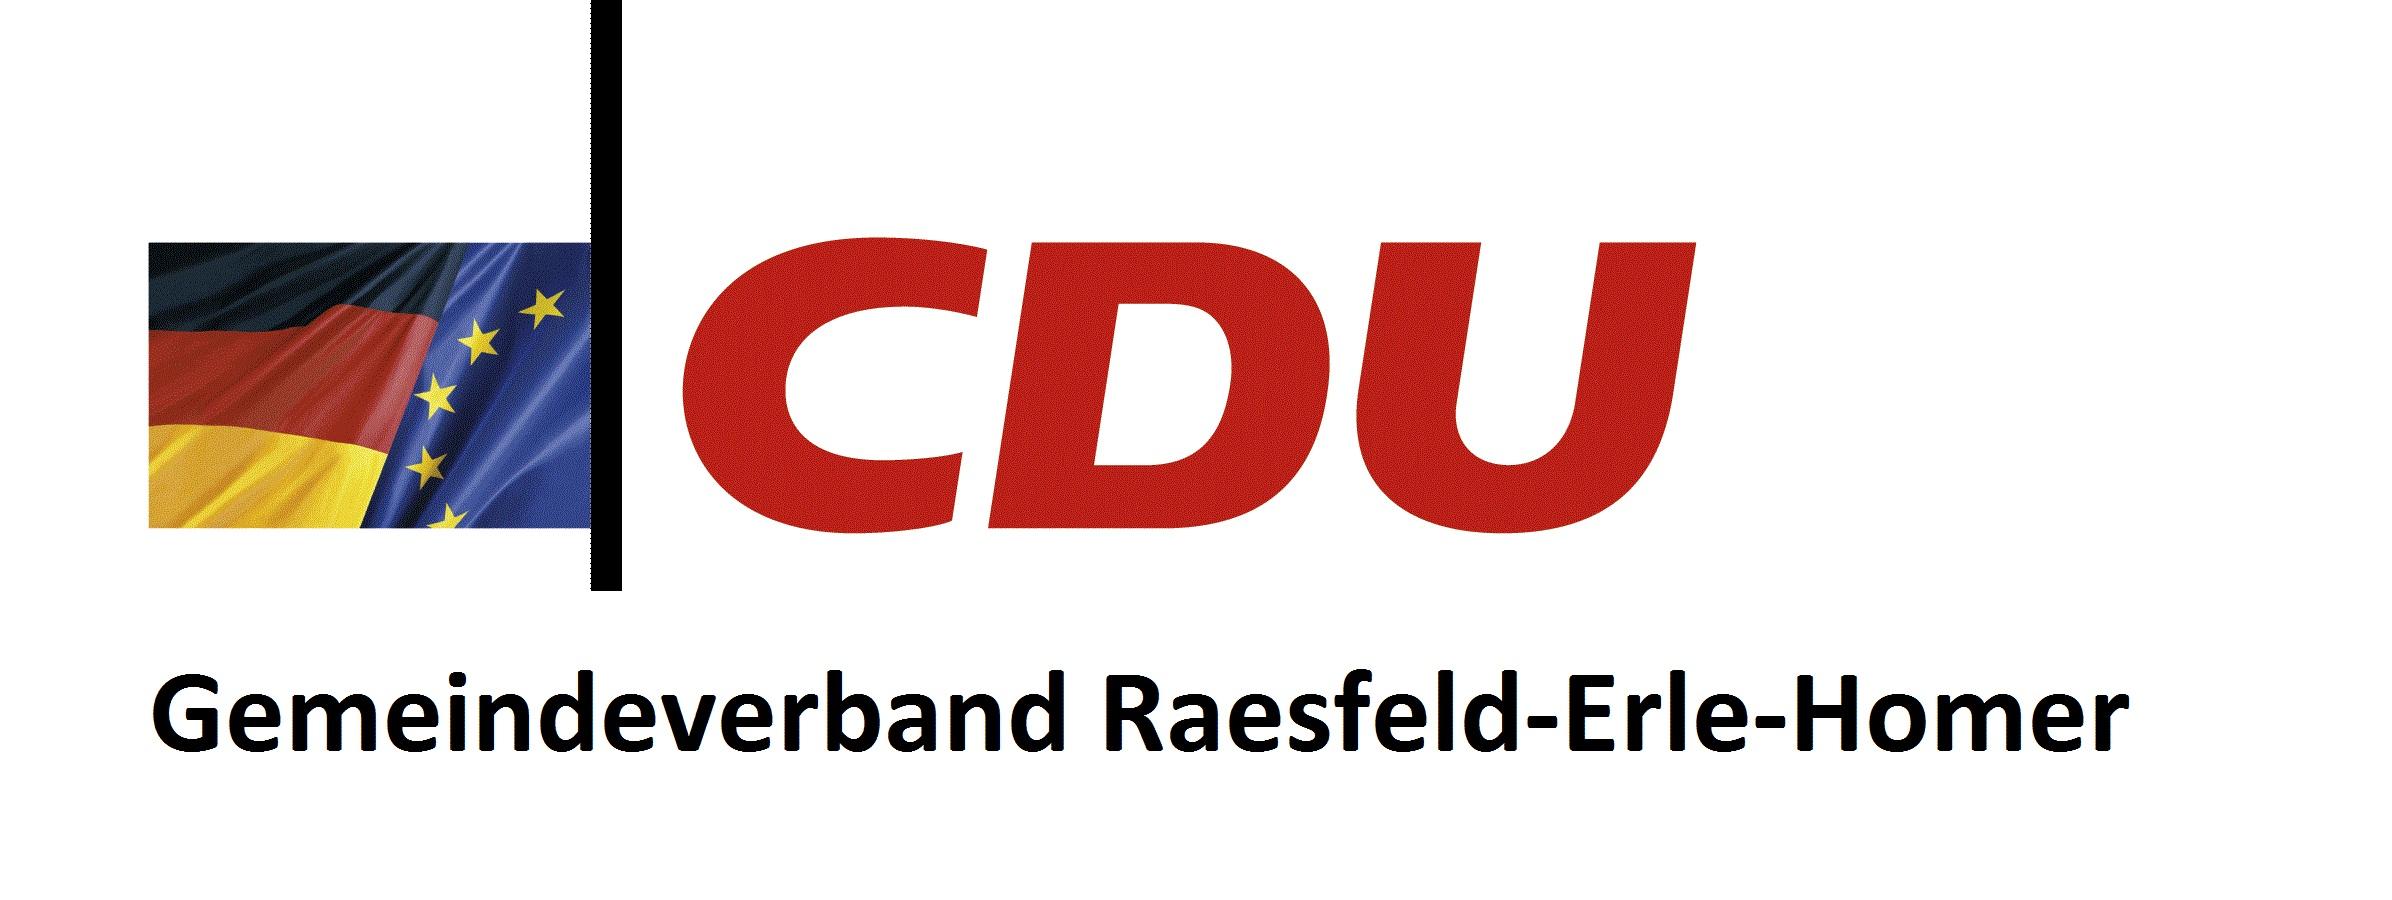 CDU-Logo R-E-H